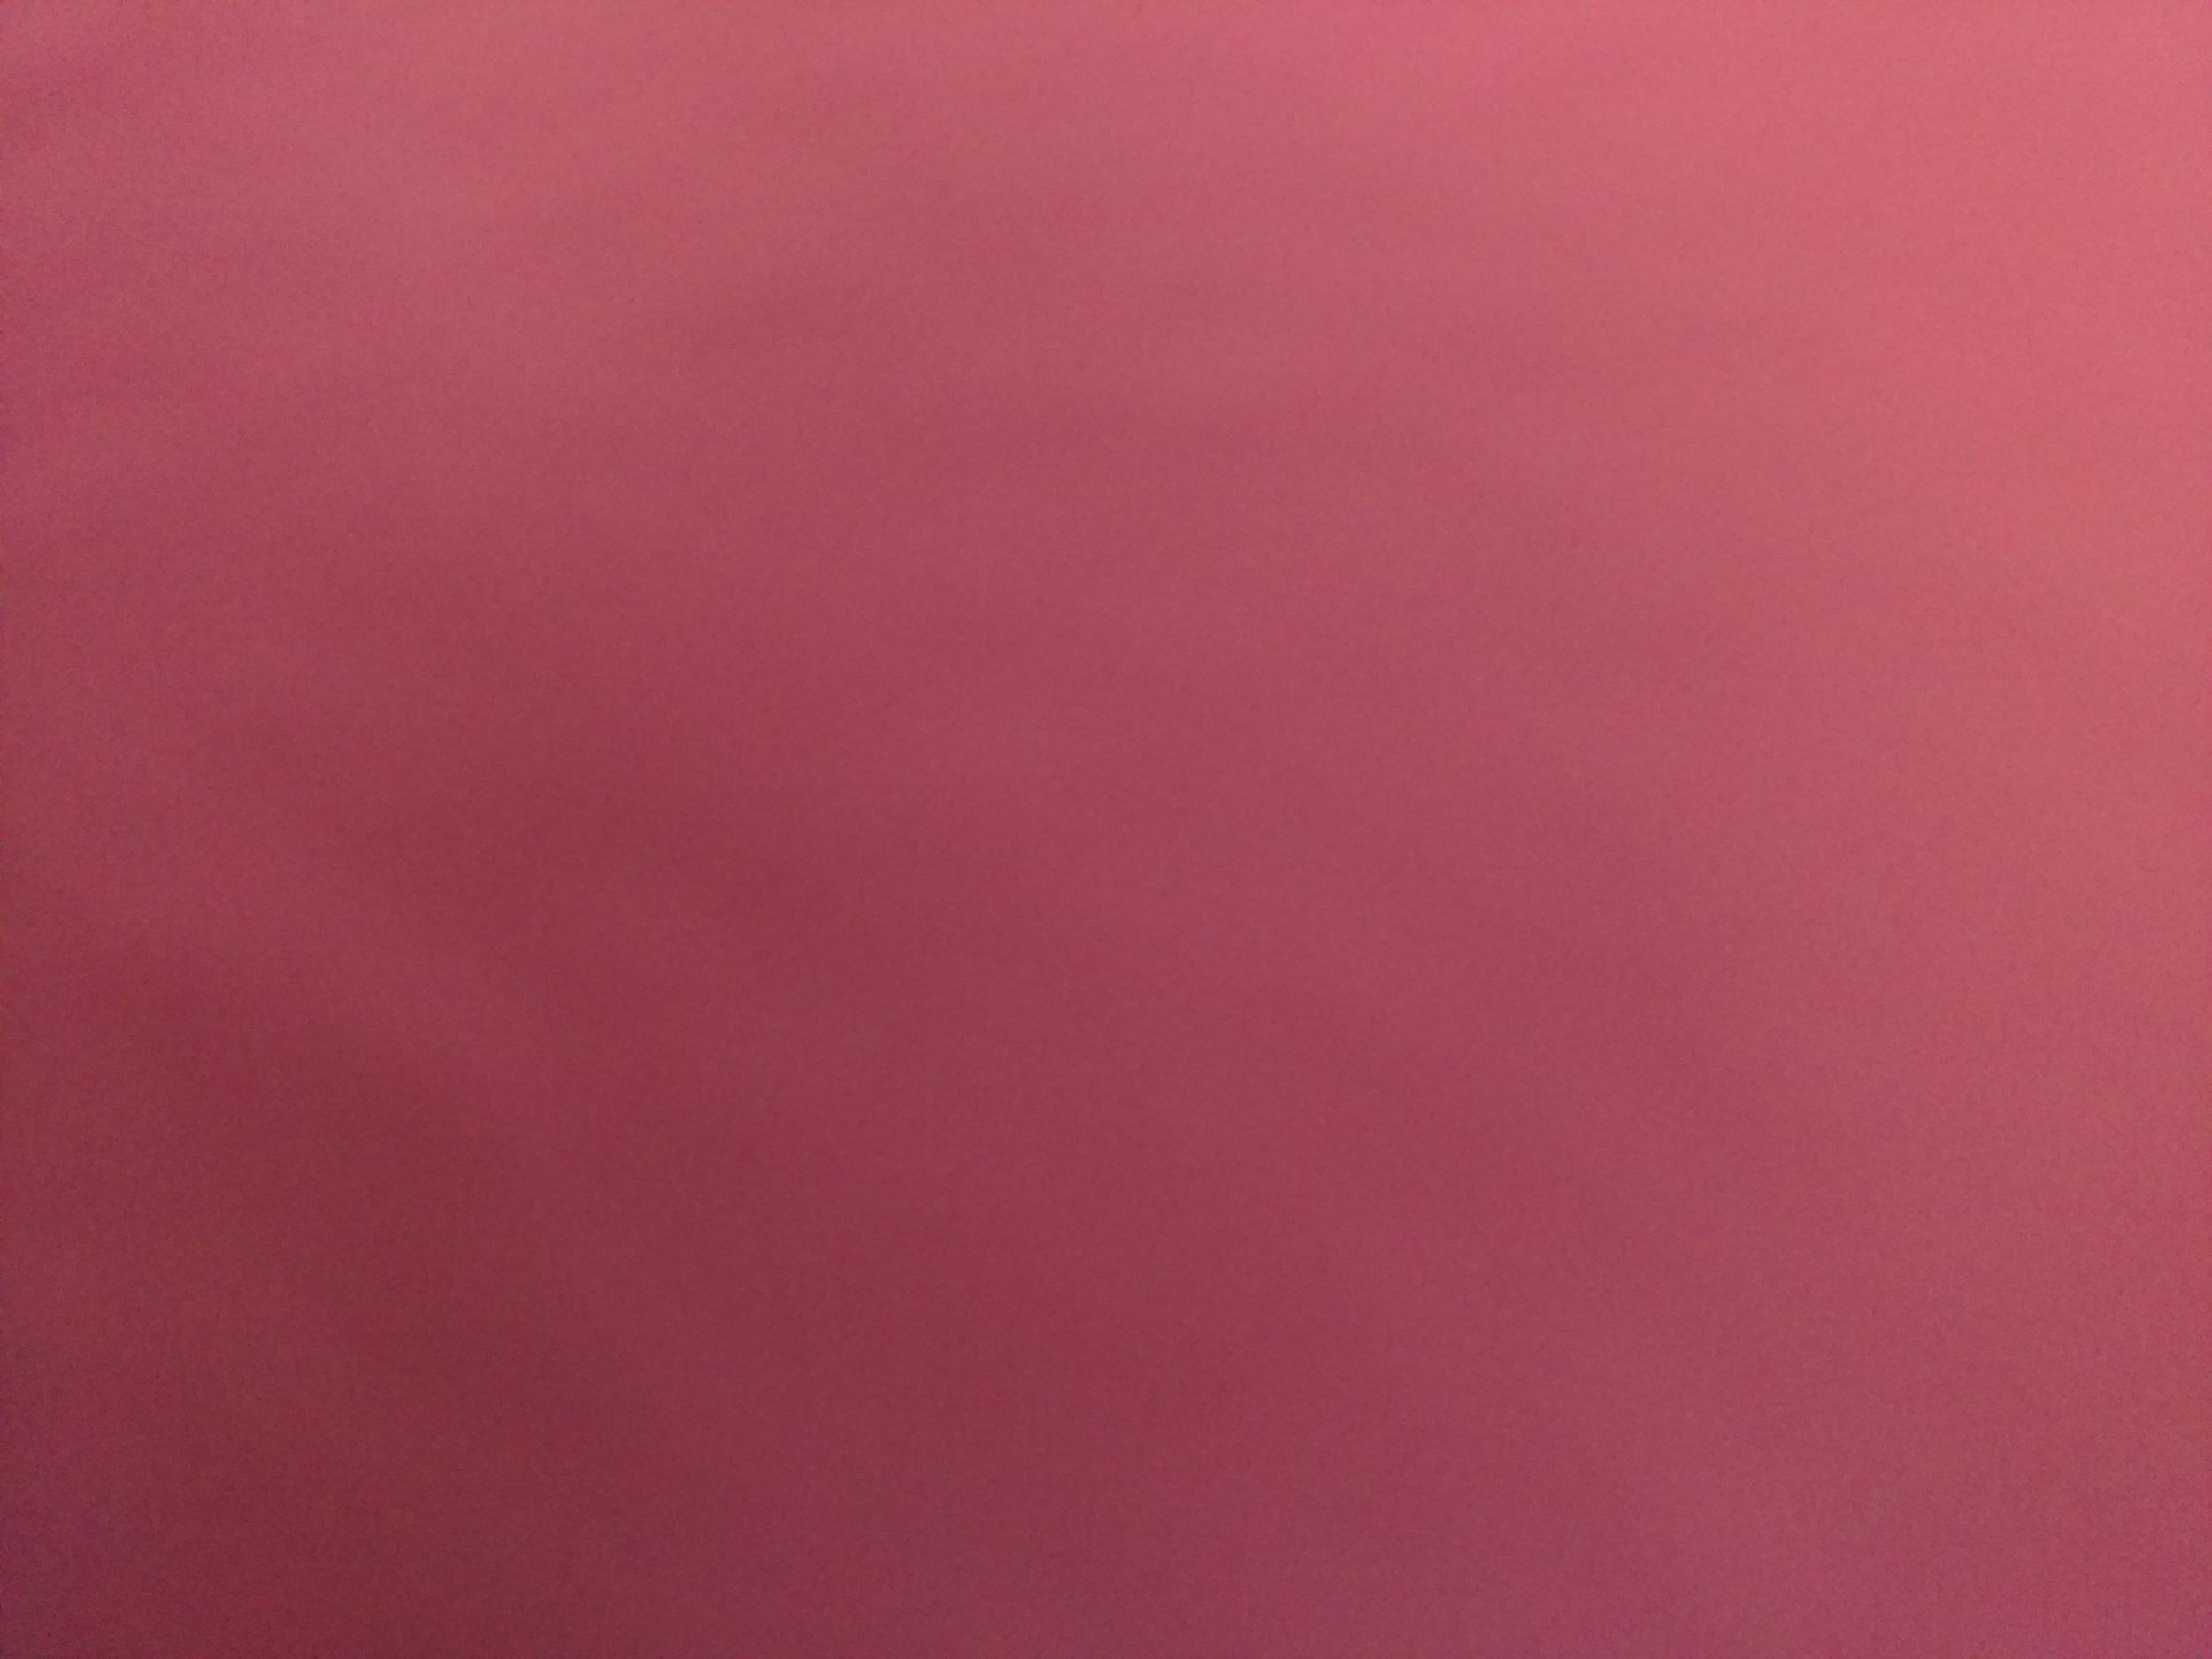 willroth-co-free-texture-gradient-094.jpg